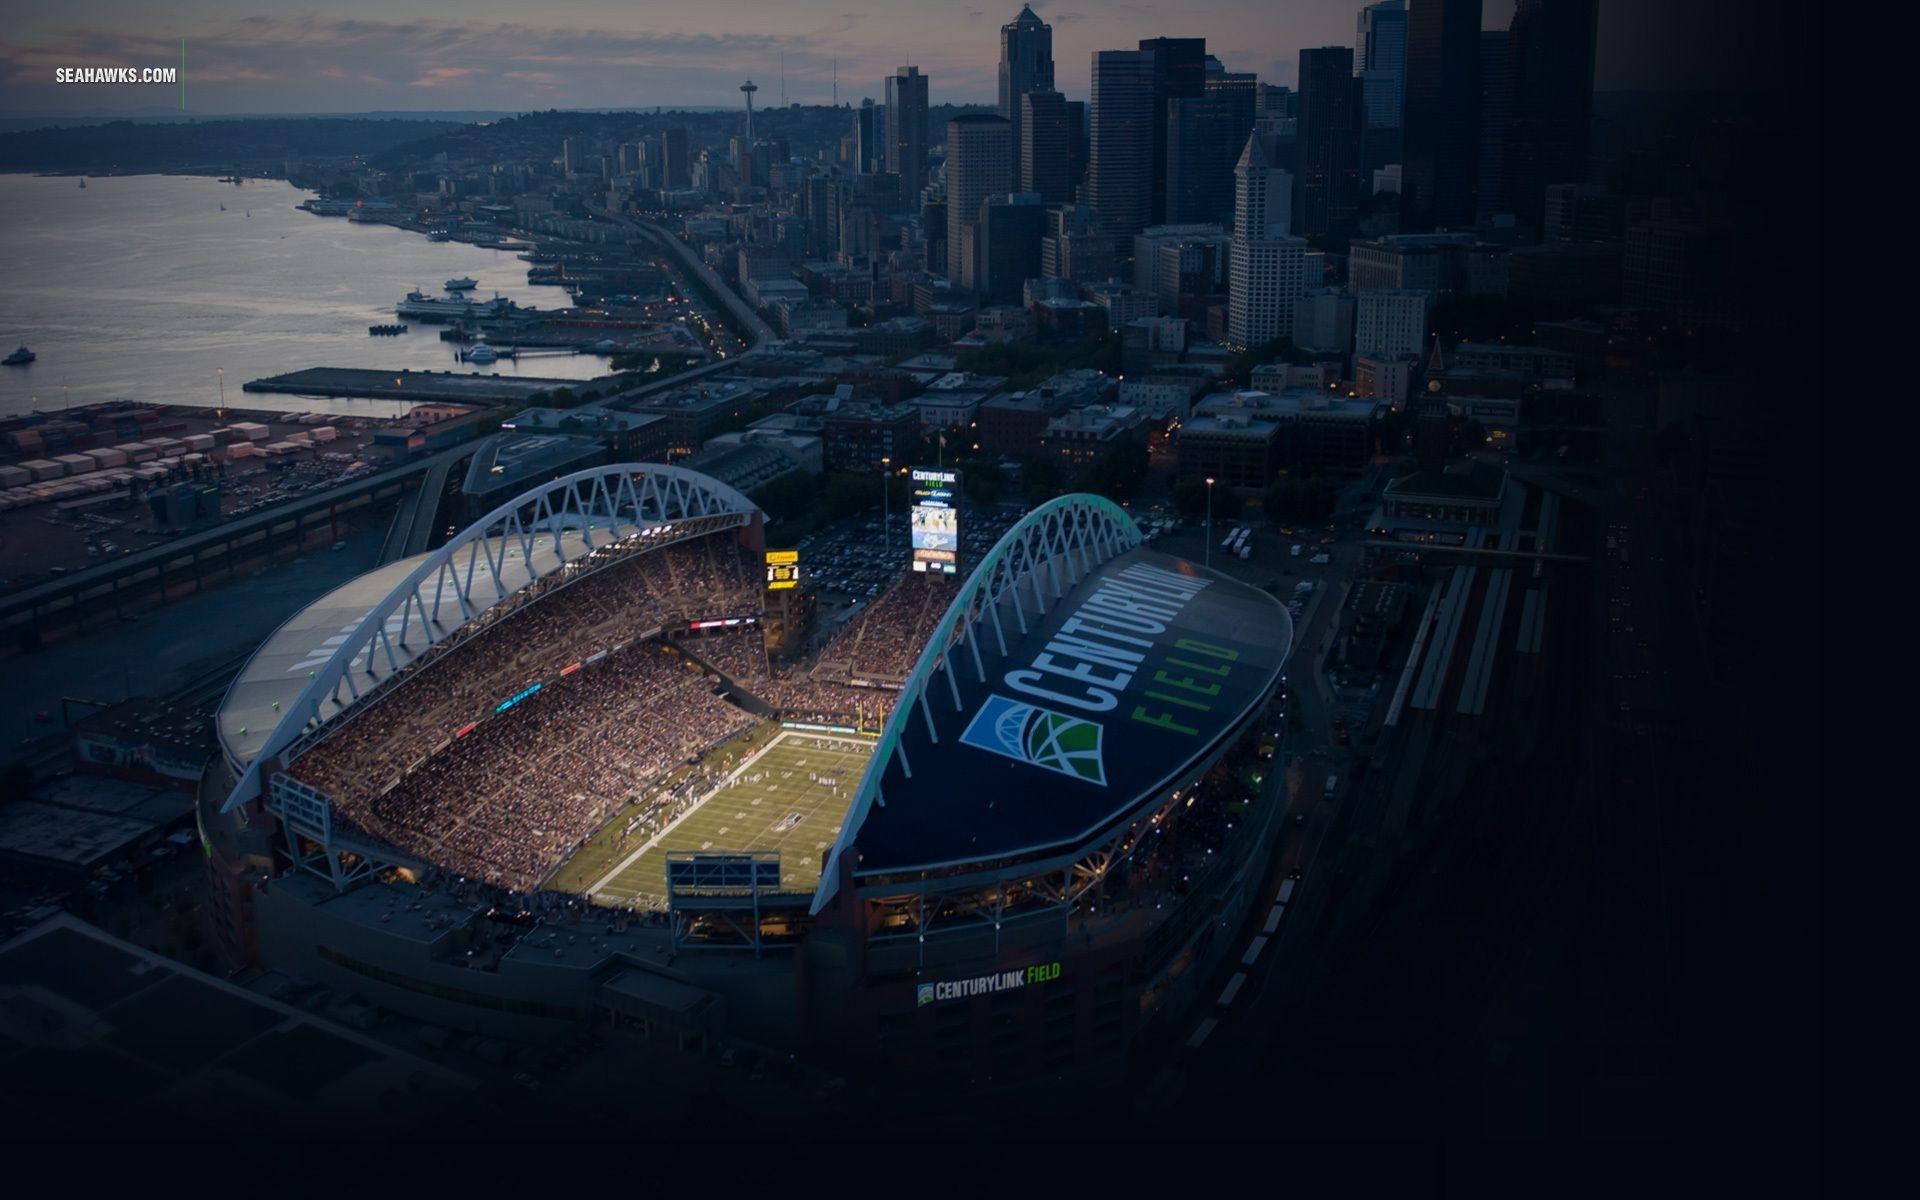 seattle seahawks stadium hd wallpaper 55975 1920x1200 px